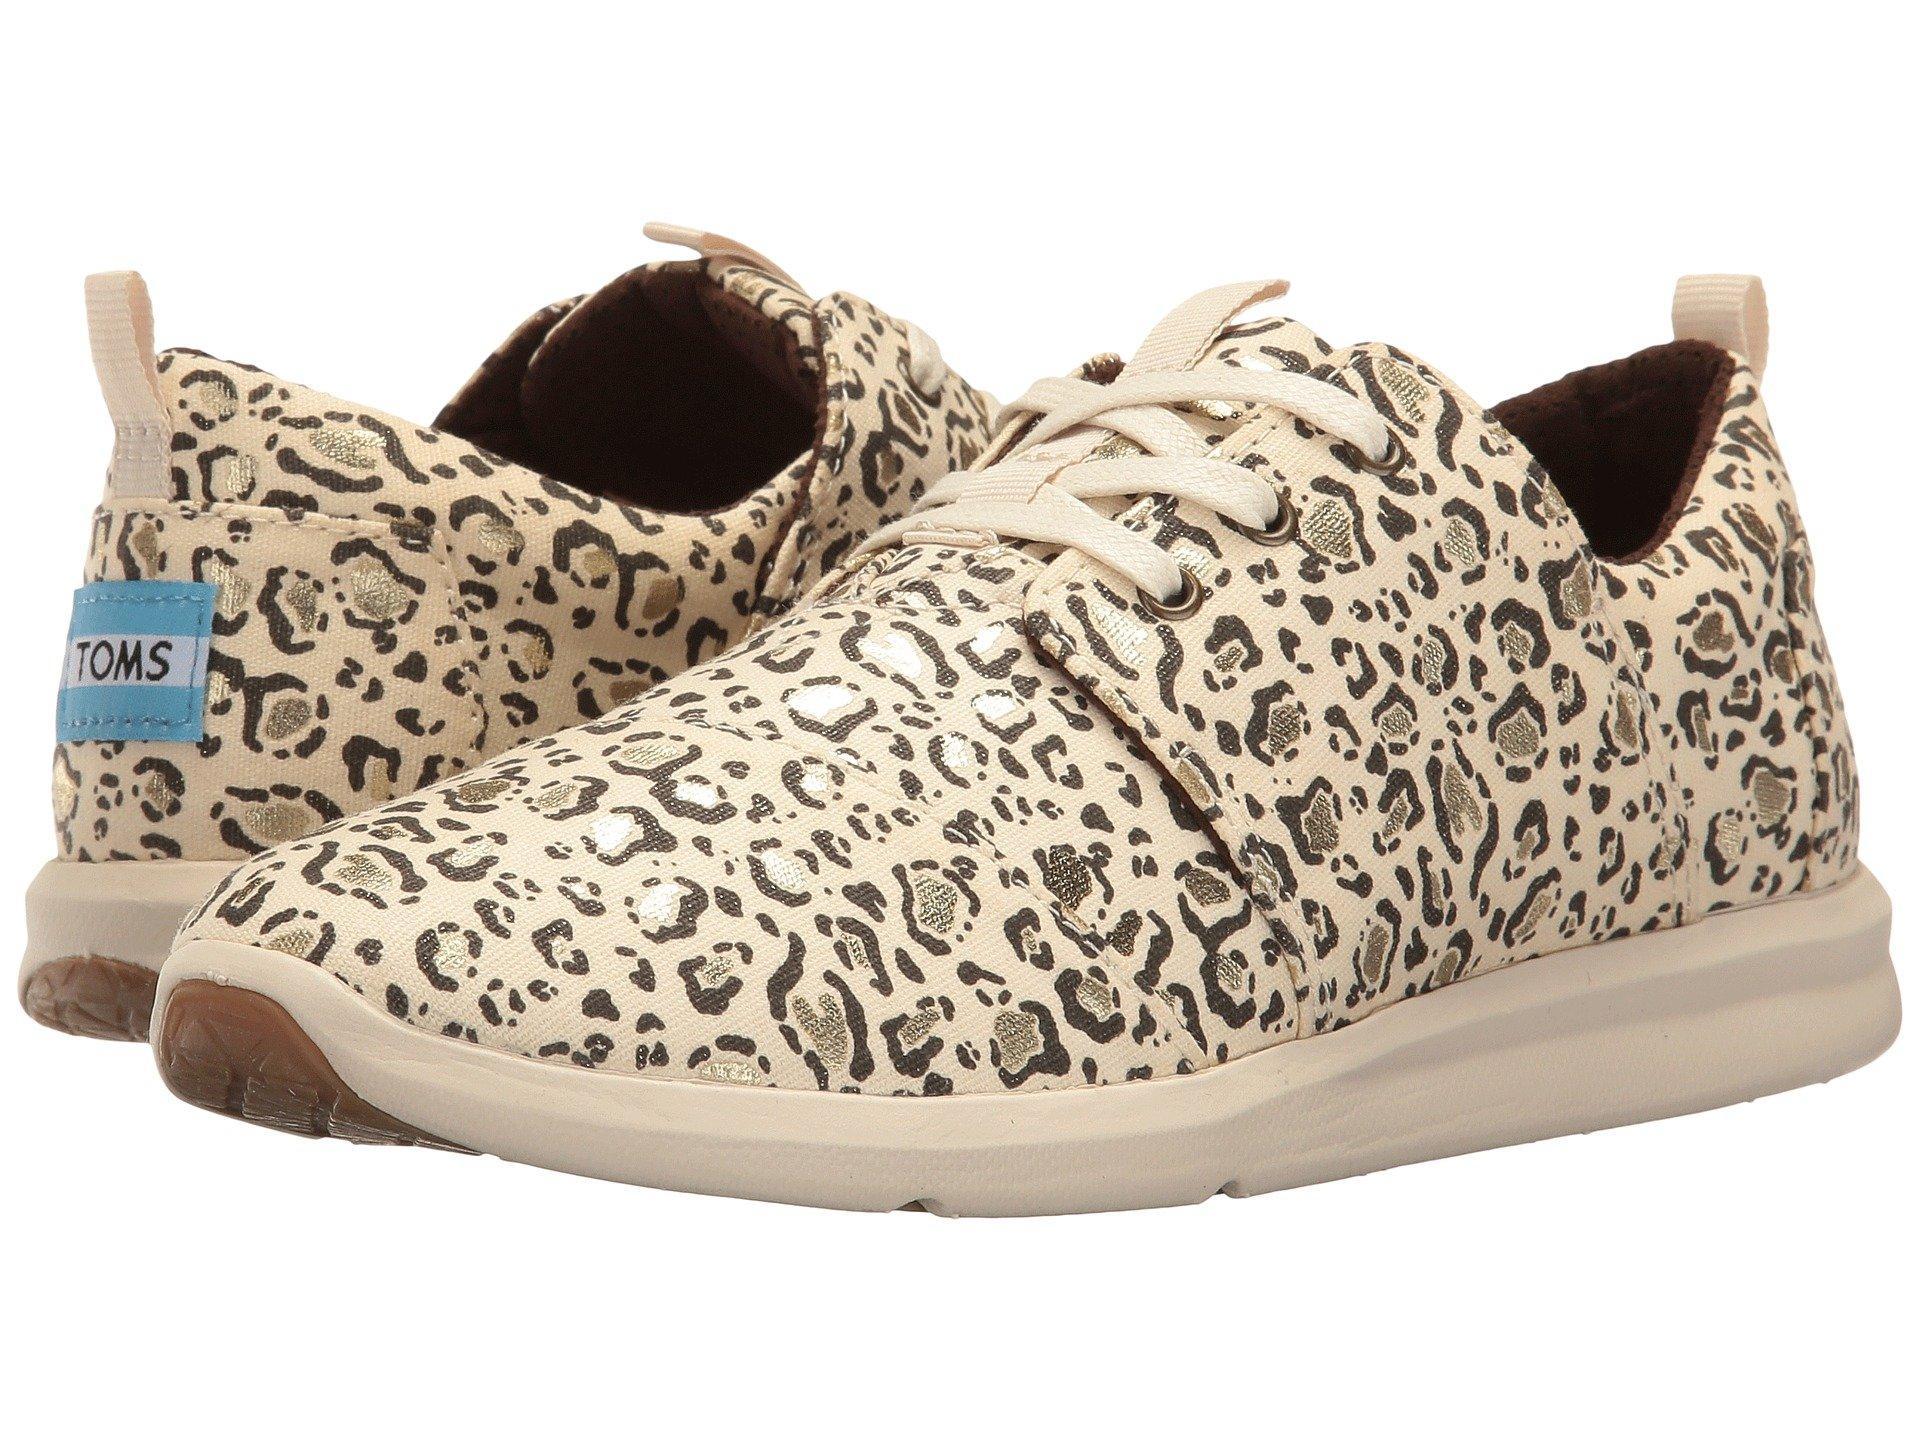 a9289c20829 Toms Del Rey Sneaker, Natural Bobcat/Gold Foil | ModeSens